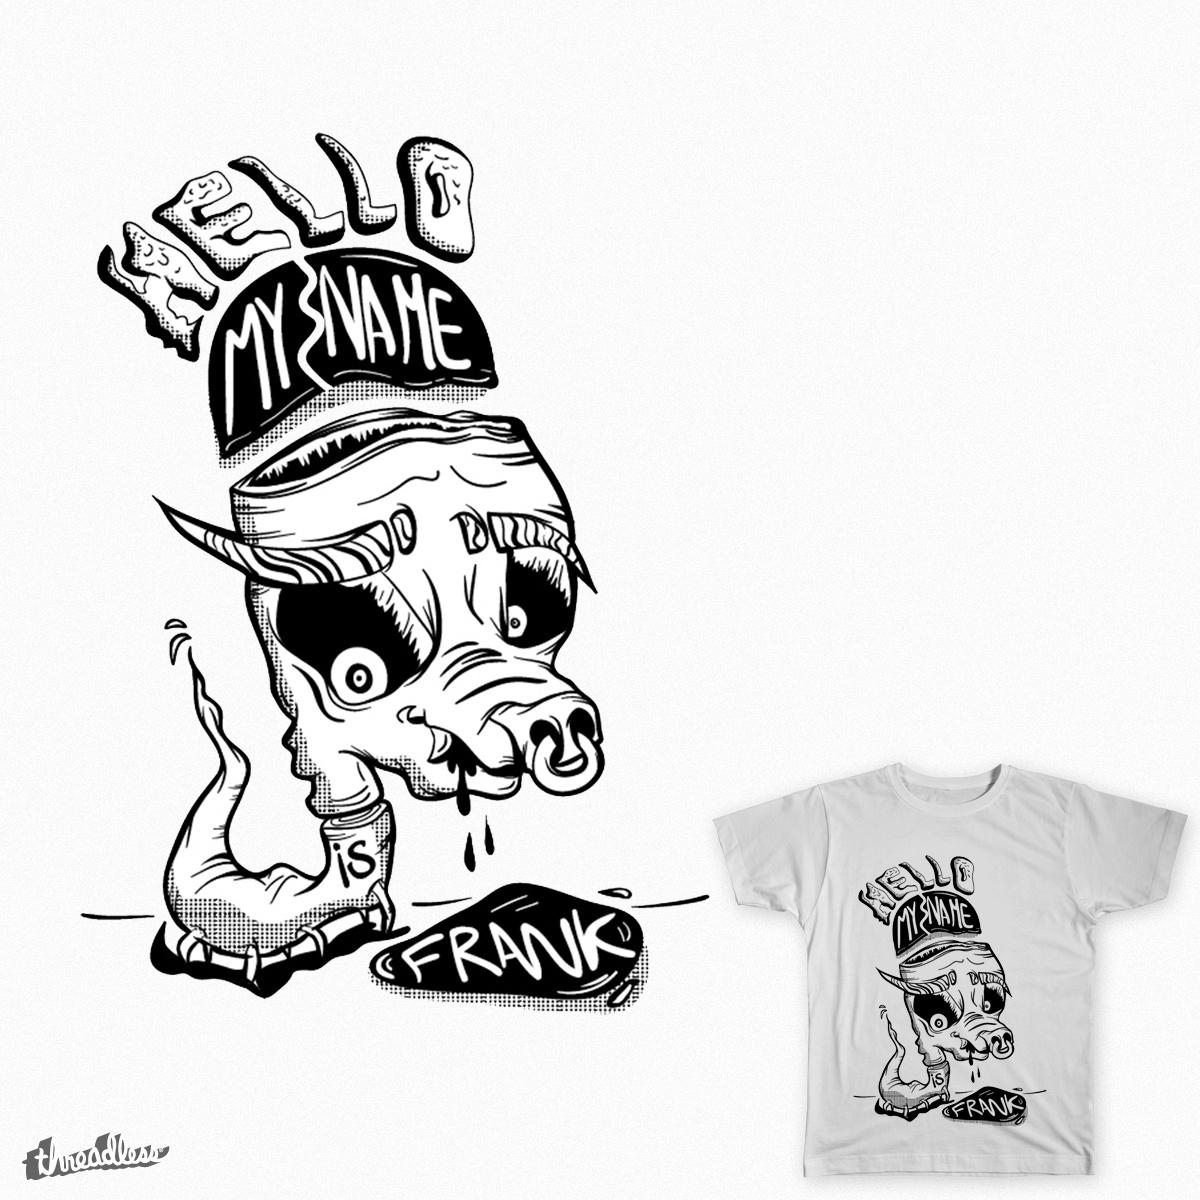 Meet Frank by RARA- on Threadless